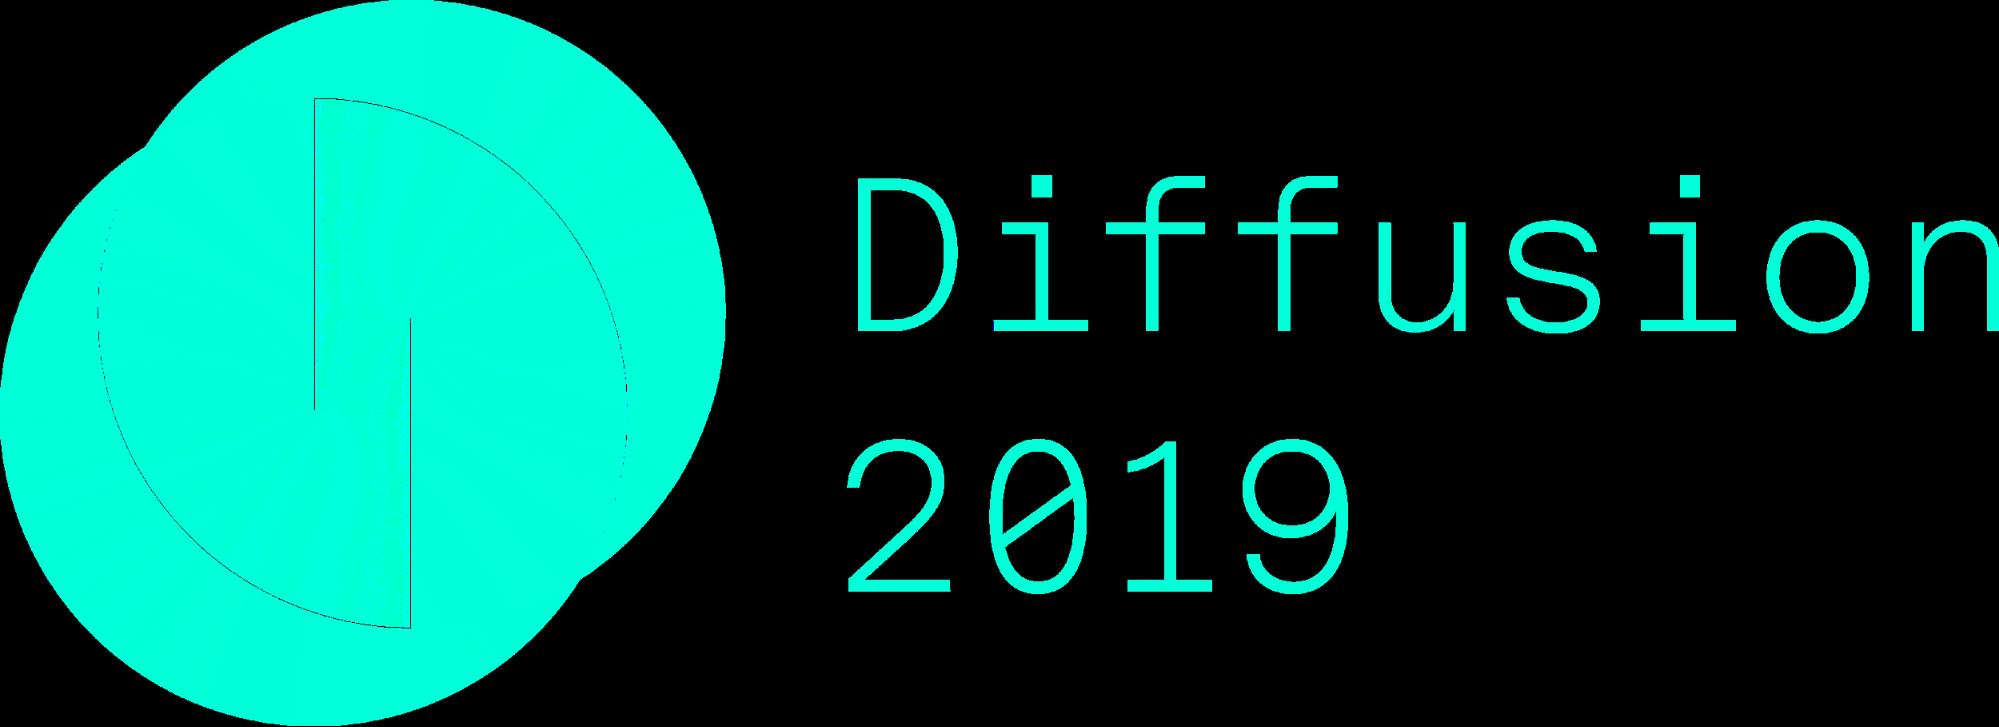 Diffusion 2019 — разработчики Fetch.AI, Cosmos, IOTA и Ocean Protocol возглавят хакатон в Берлине